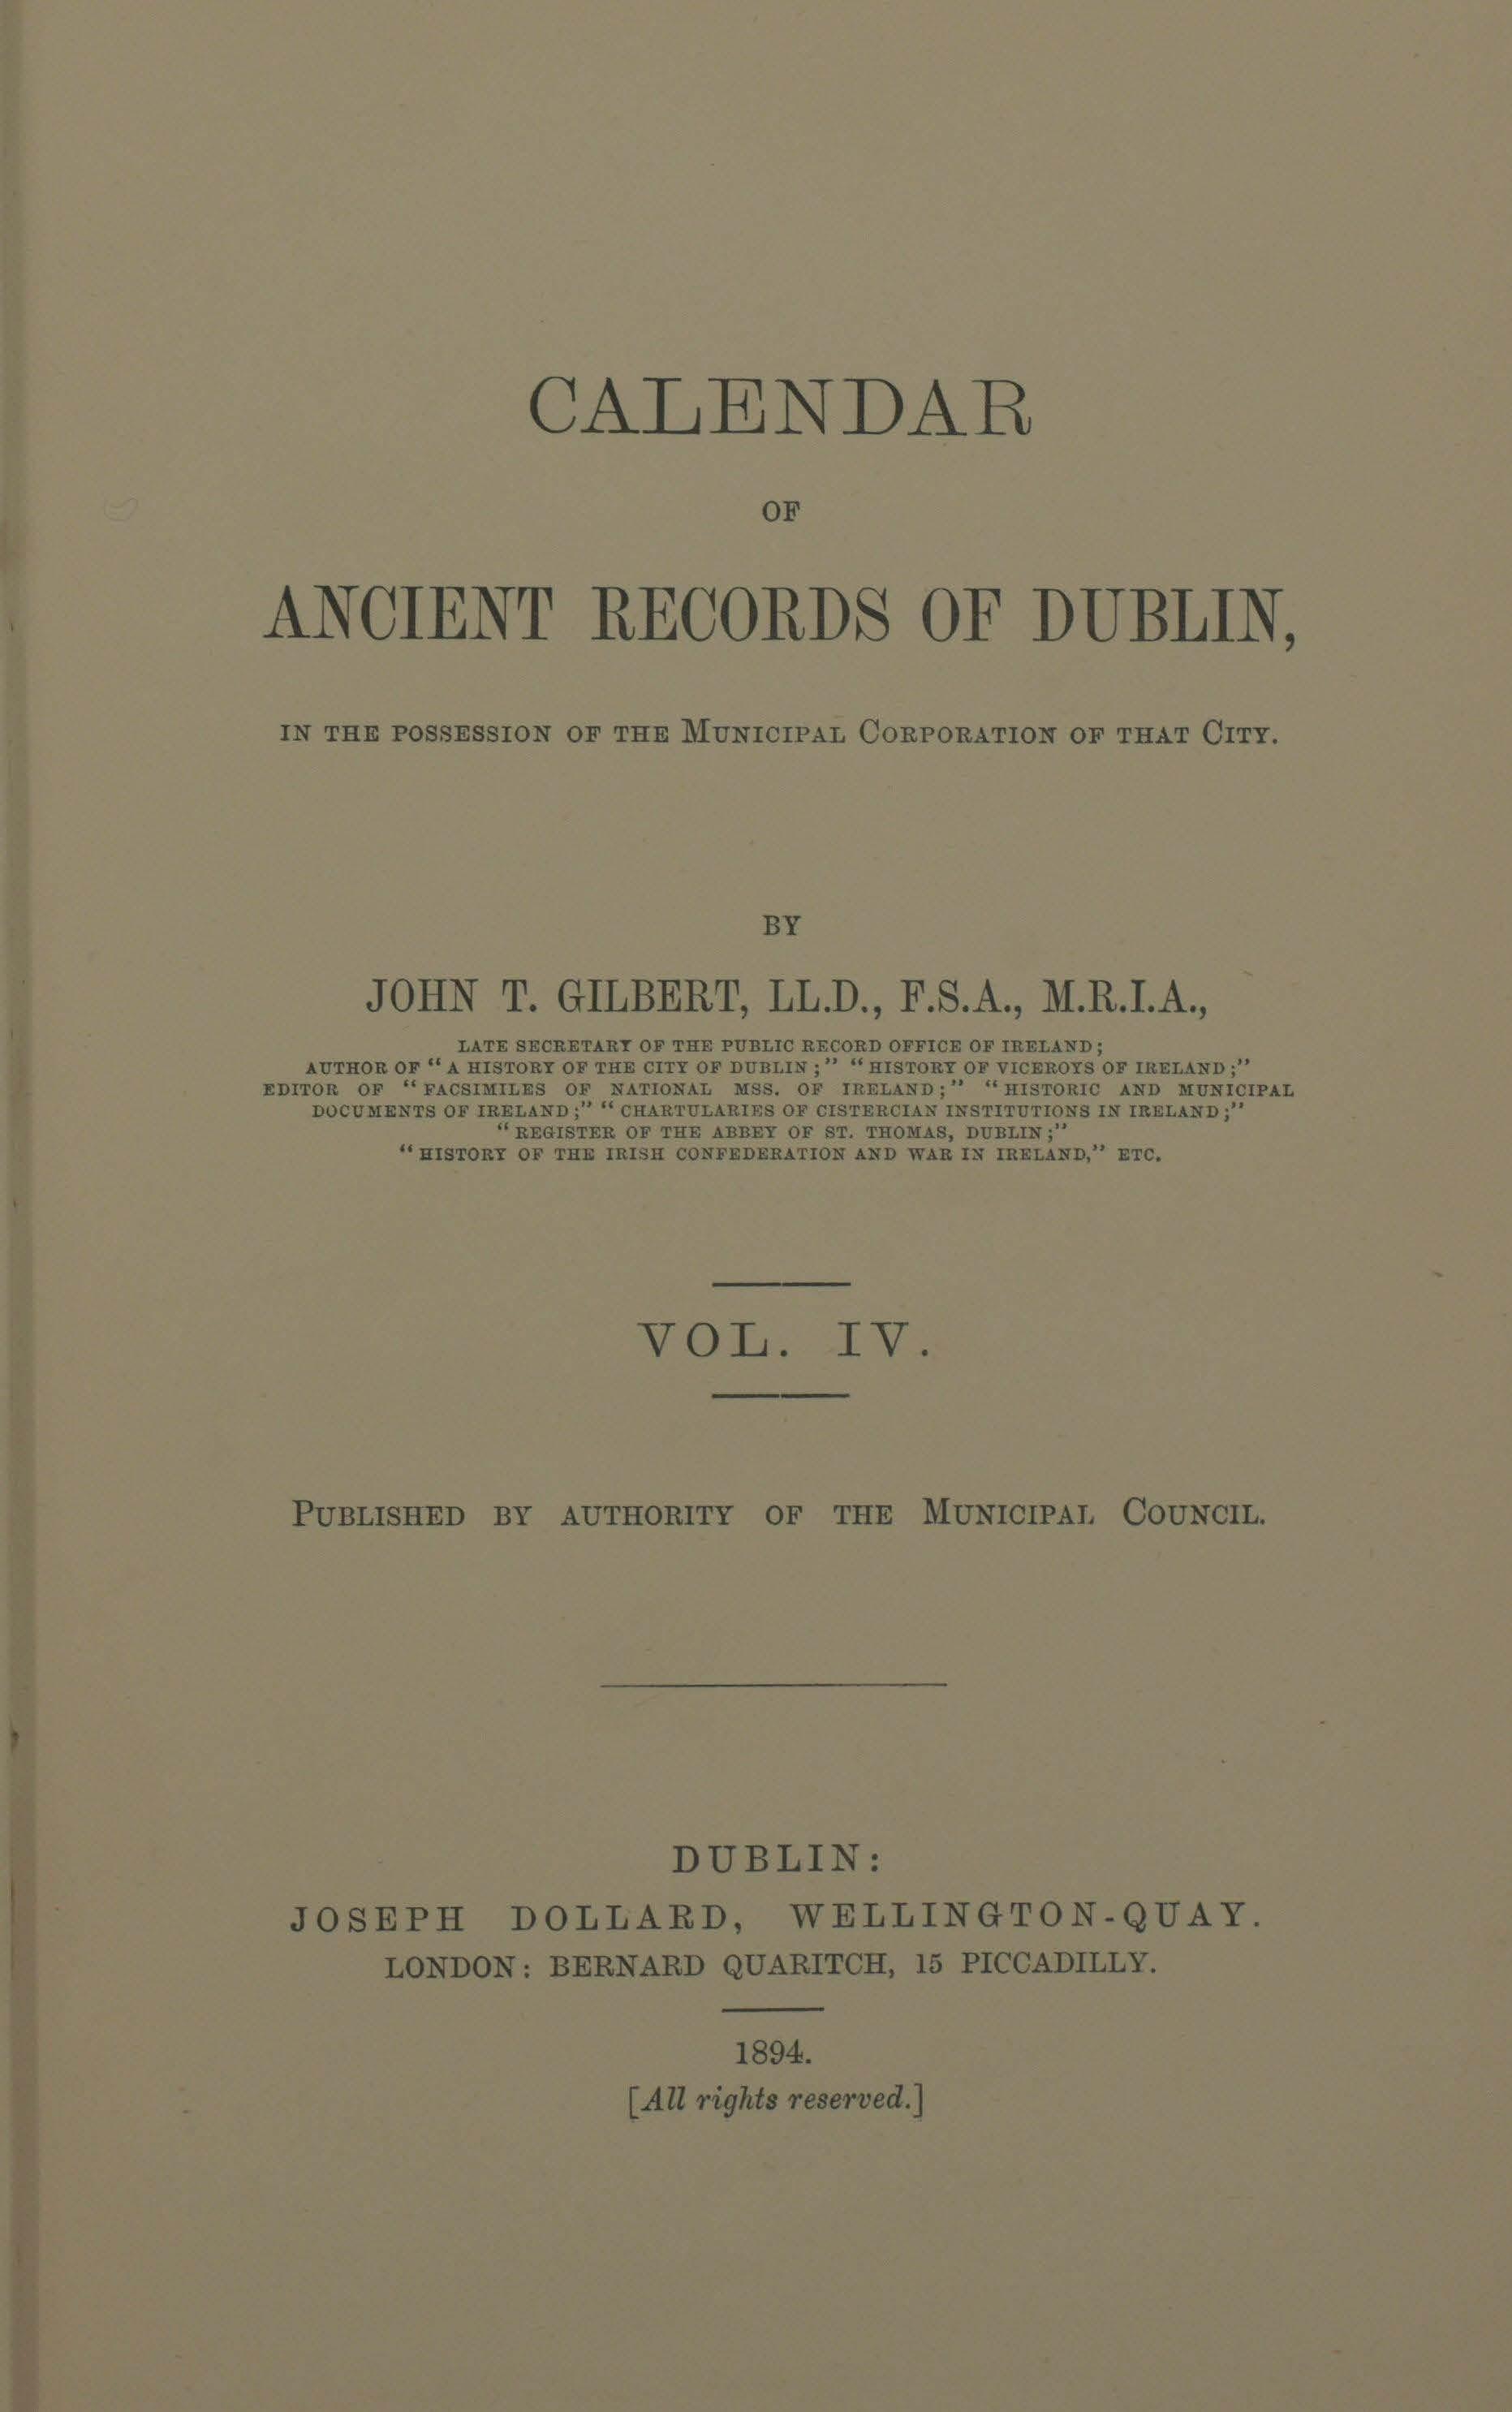 photo of Calendar of Ancient Records of Dublin Vol IV. 1894